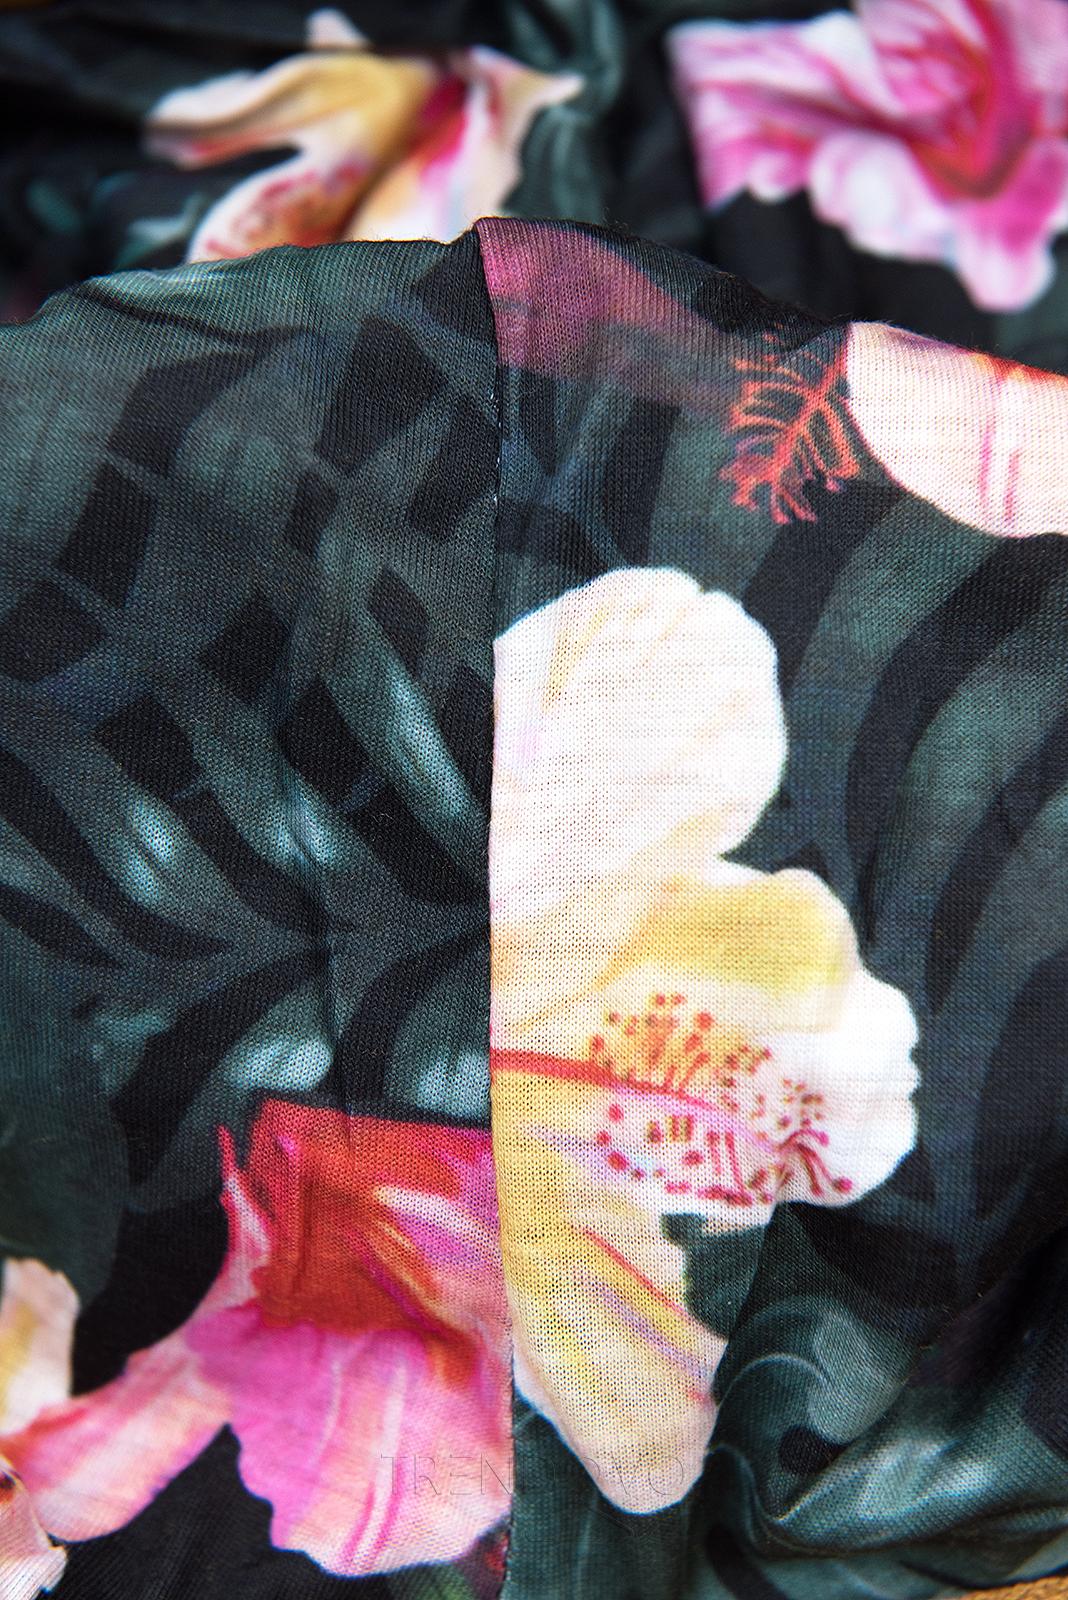 Tmavomodrá mikina s kvetinovou podšívkou